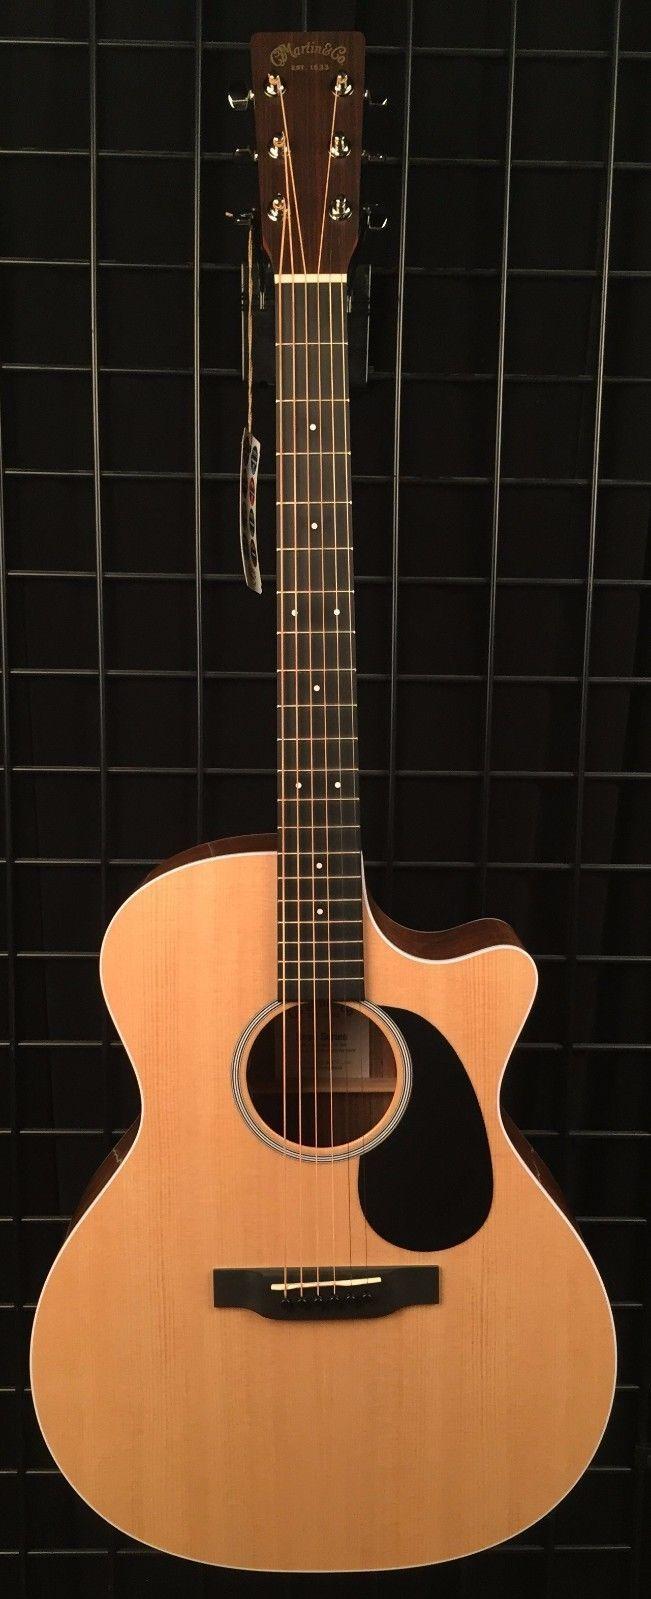 Guitar Martin Gpcrsg Grand Performance Acoustic Electric Guitar Natural Gloss W Hsc Please Retweet Guitar Acoustic Electric Guitar Acoustic